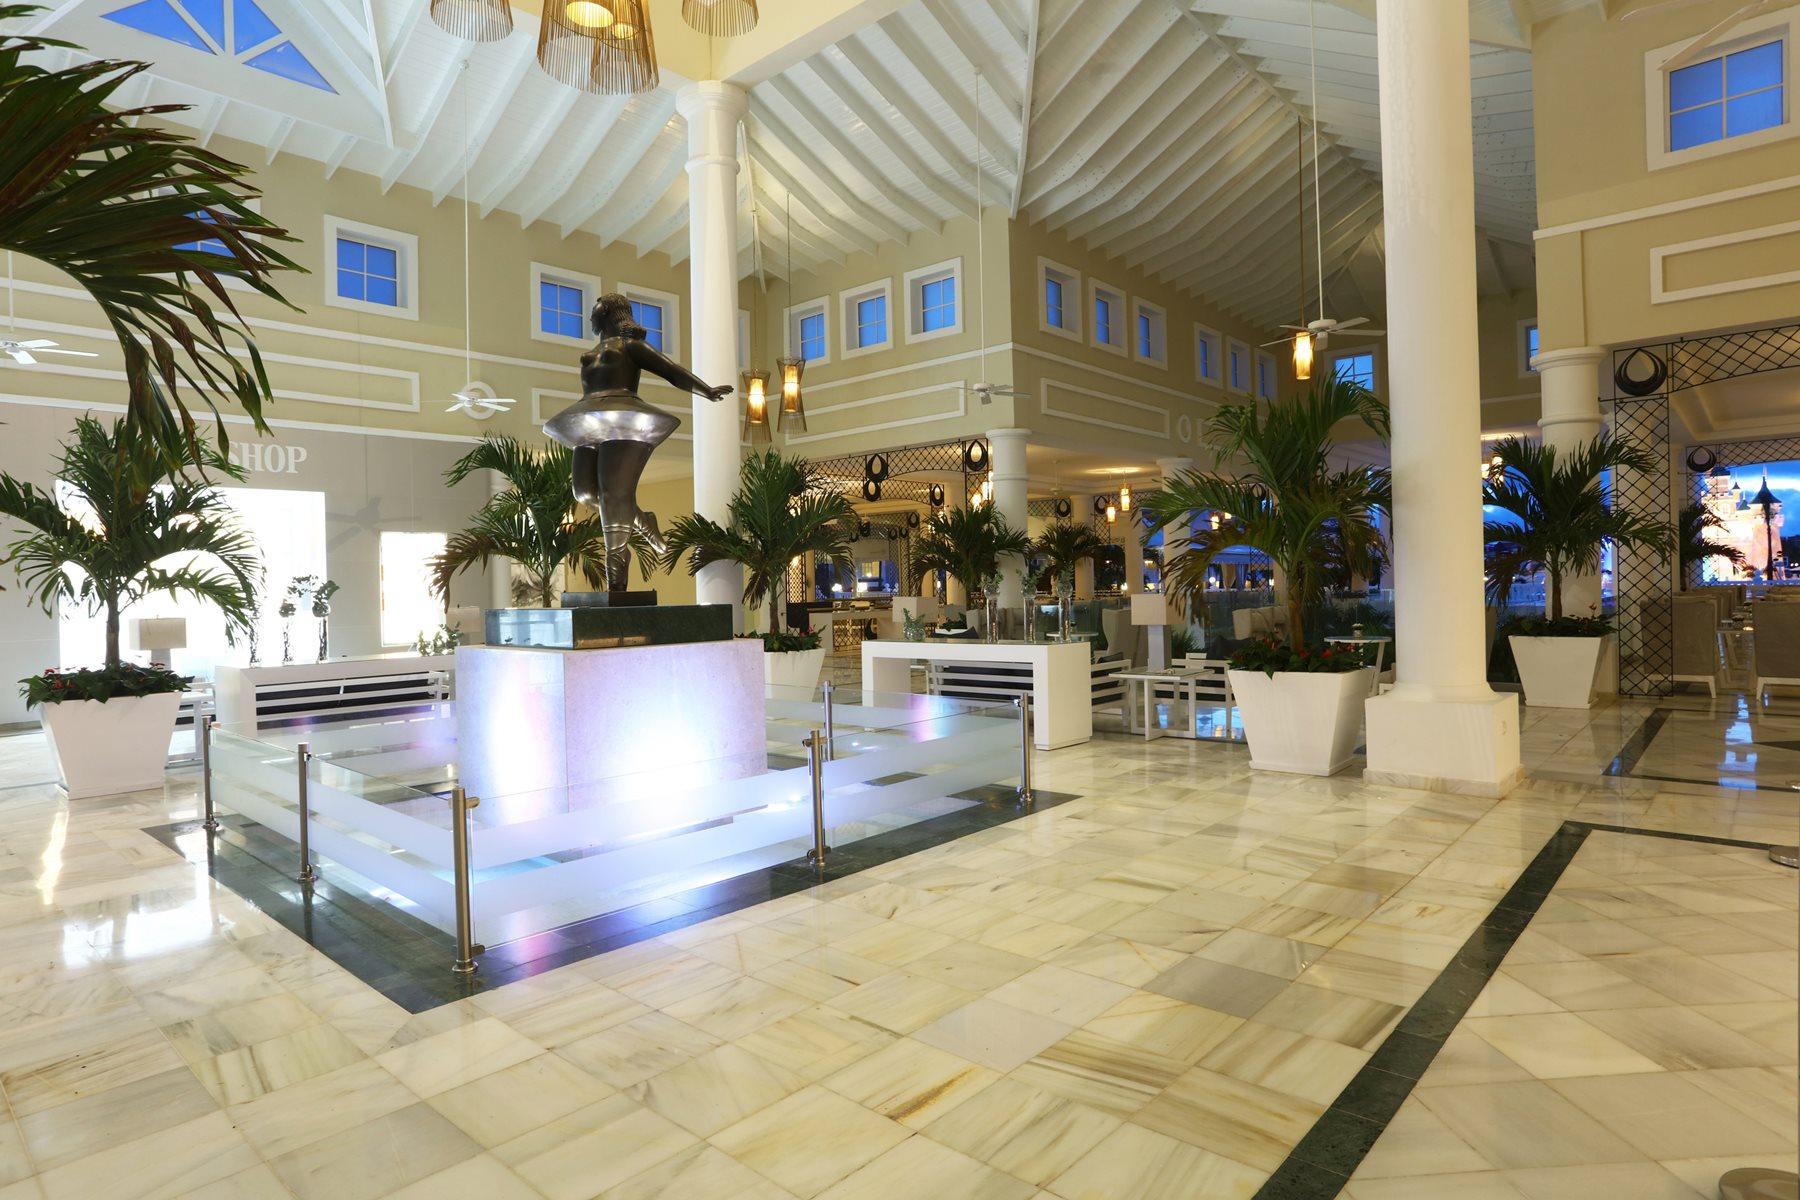 Luxury-Bahia-Principe-Fantasia-Lobby-002